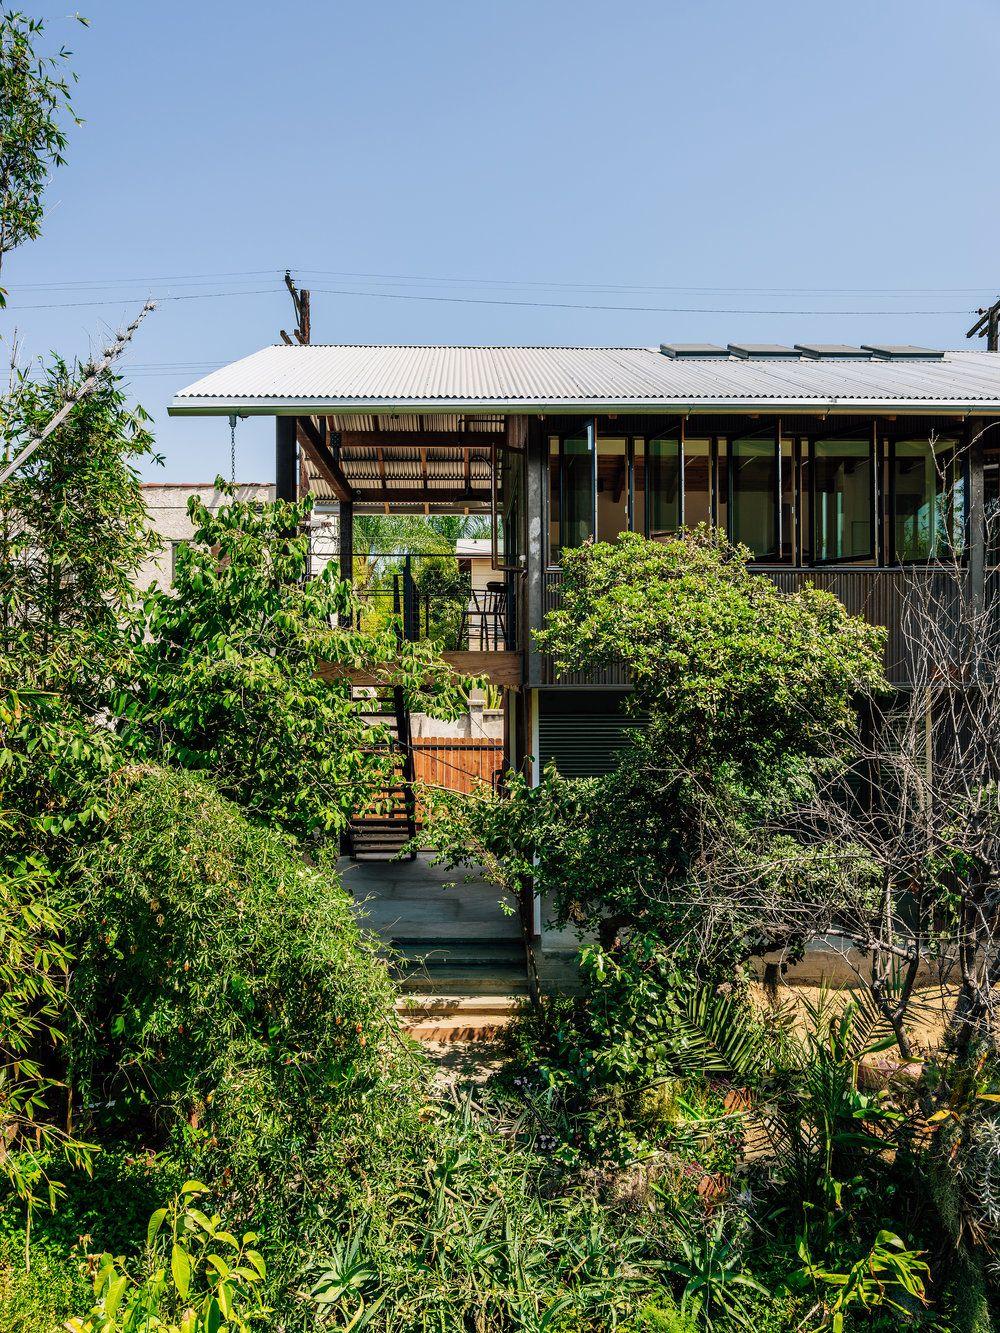 Alec Petros Studio Alecpetrosstudio Timmelideo Modern Design La Architect San Diego Architect Alecpe Canopy Corrugated Roofing Architecture